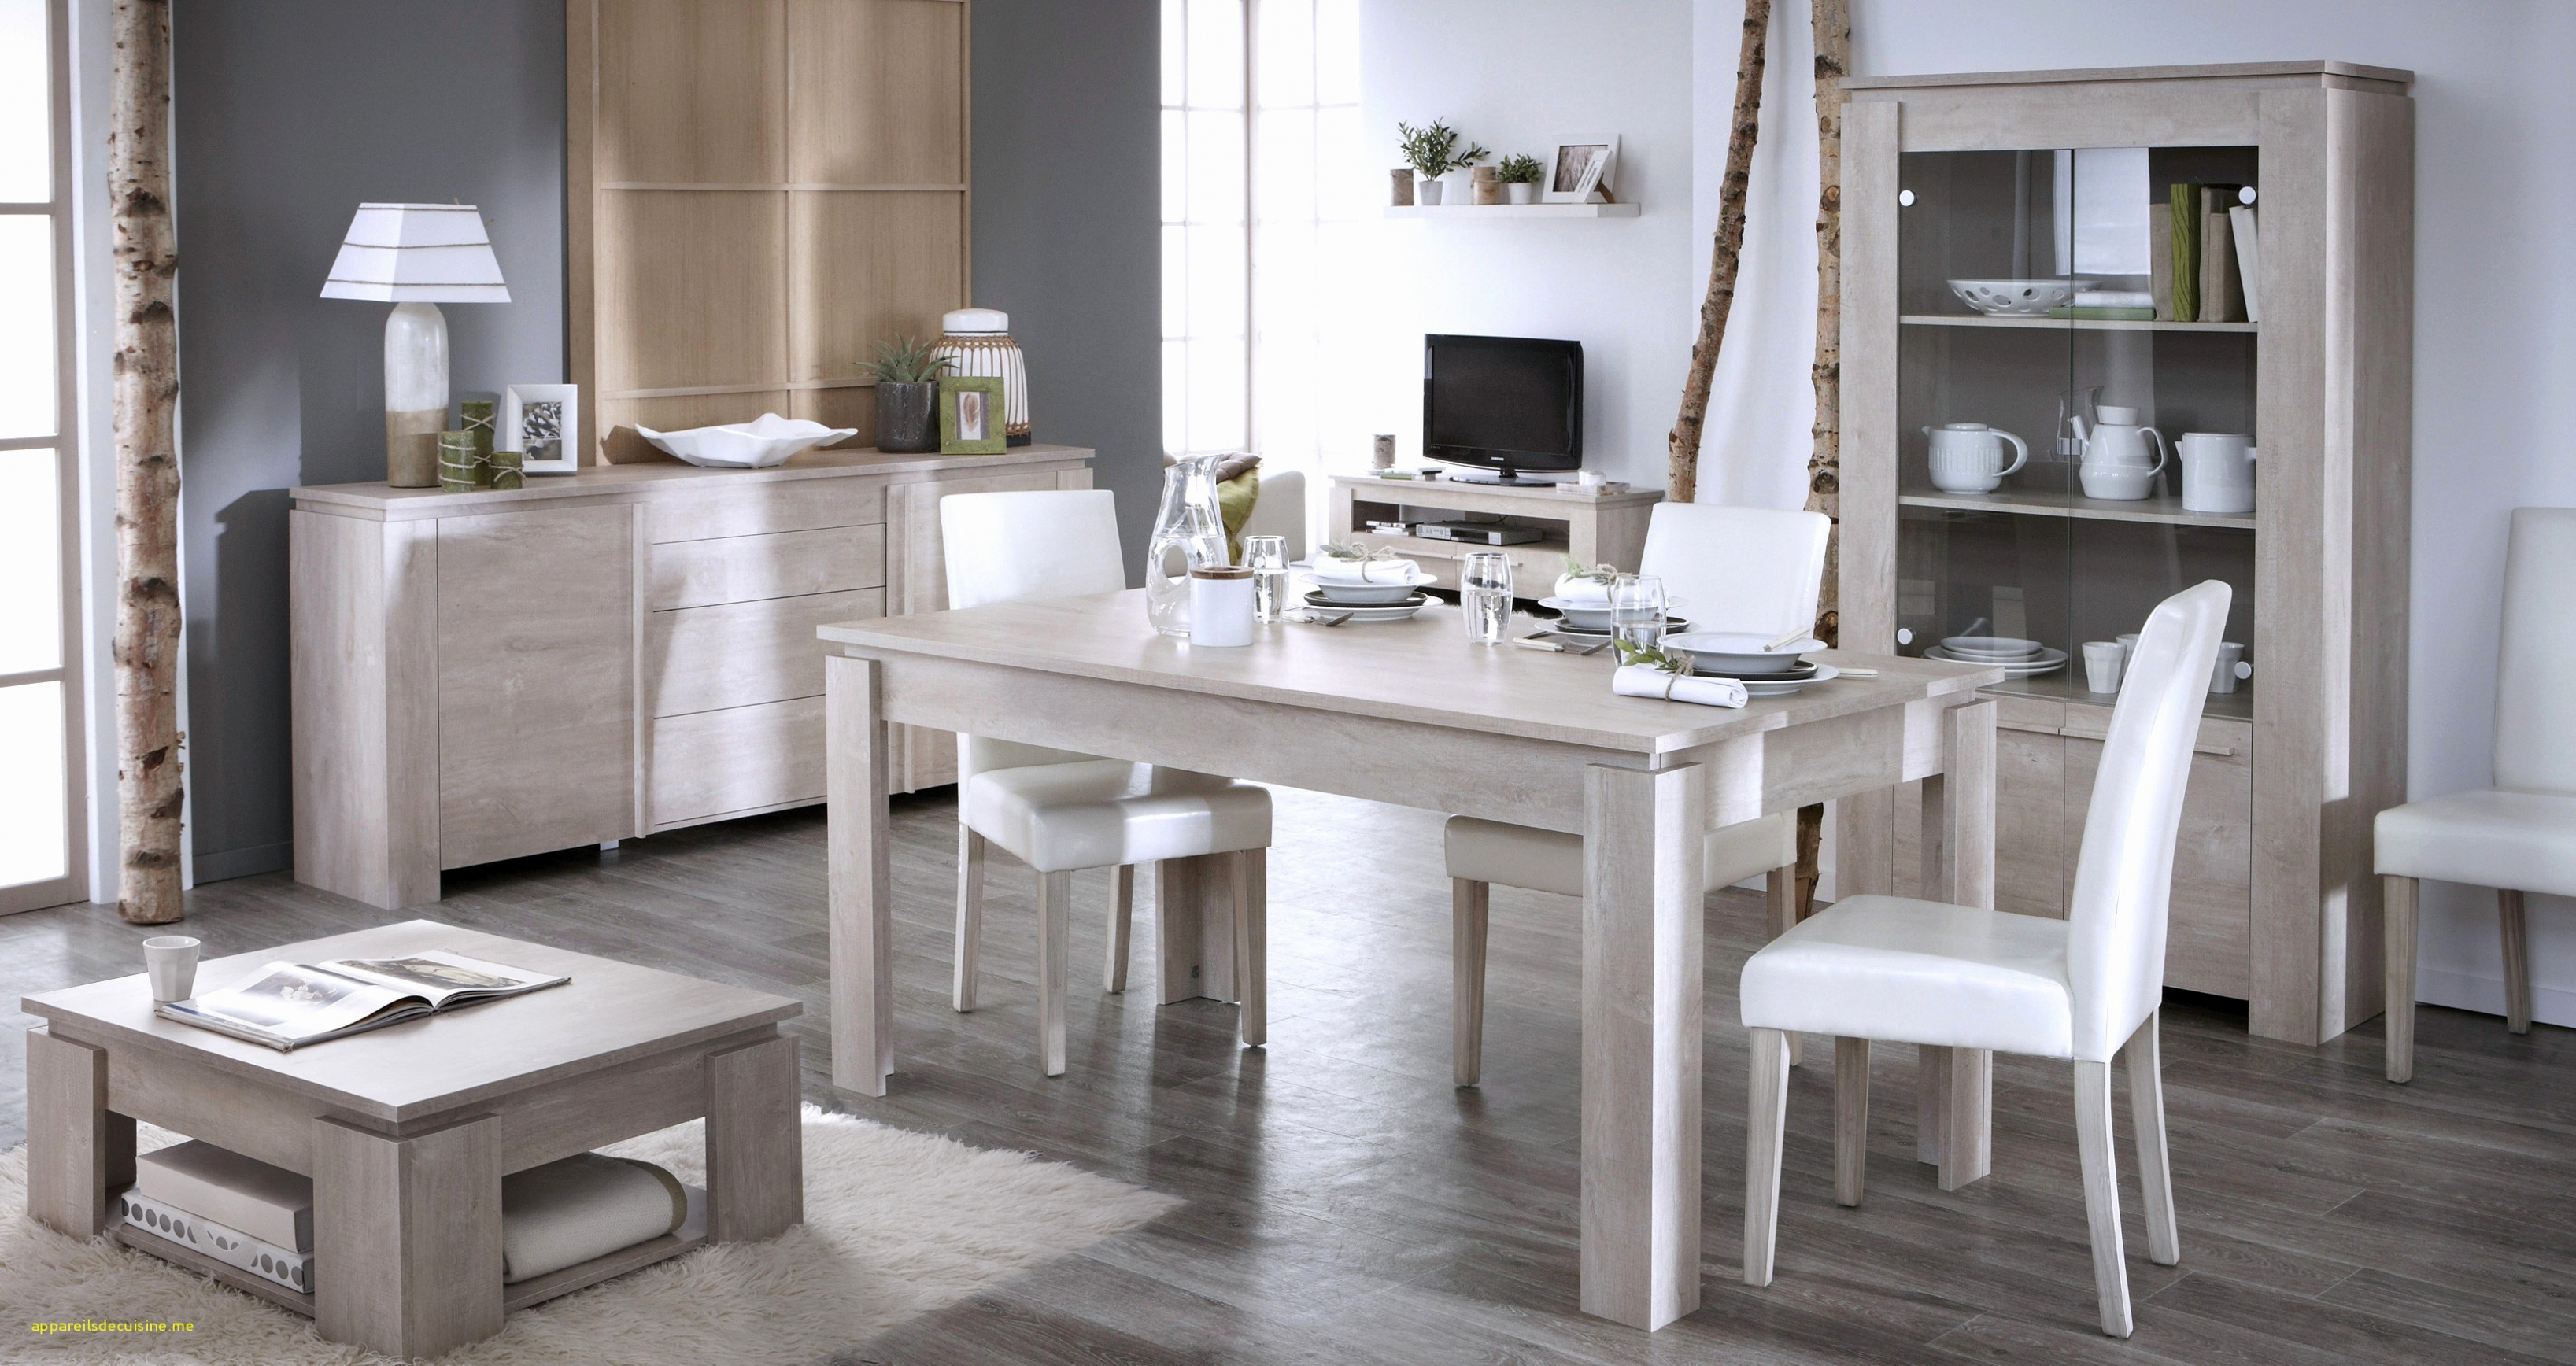 Table Cuisine Conforama Impressionnant Collection Maha De Table De Sejour Mahagranda De Home